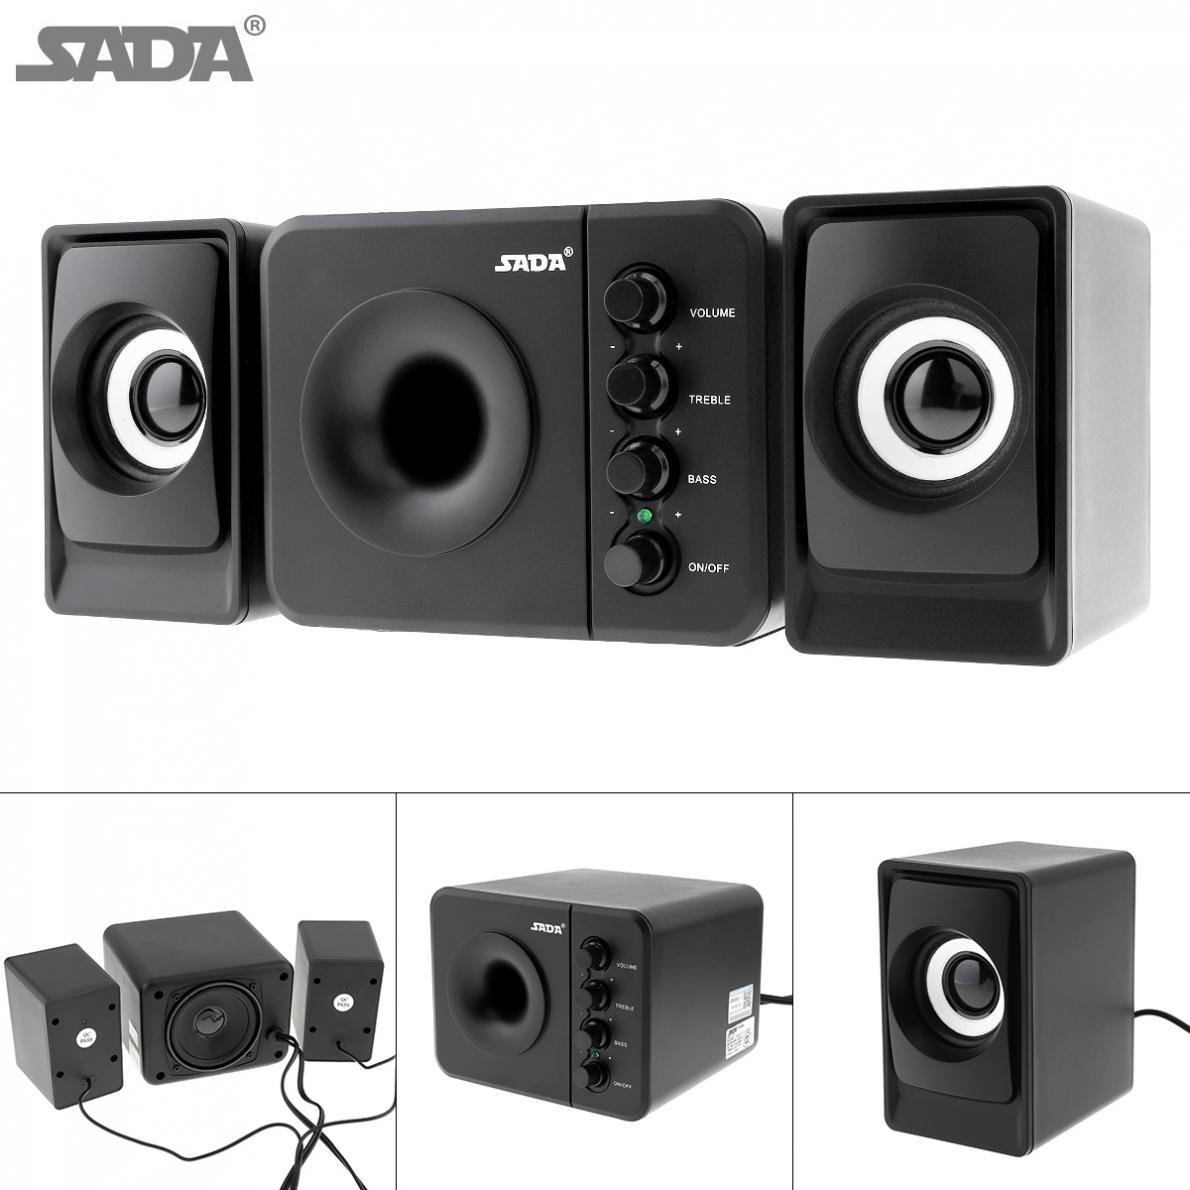 SADA D-205 USB2.0 Subwoofer Computer Speaker with 3.5mm Audio Plug and USB Power Plug for Desktop PC Laptop MP3 Cellphone MP4 стоимость